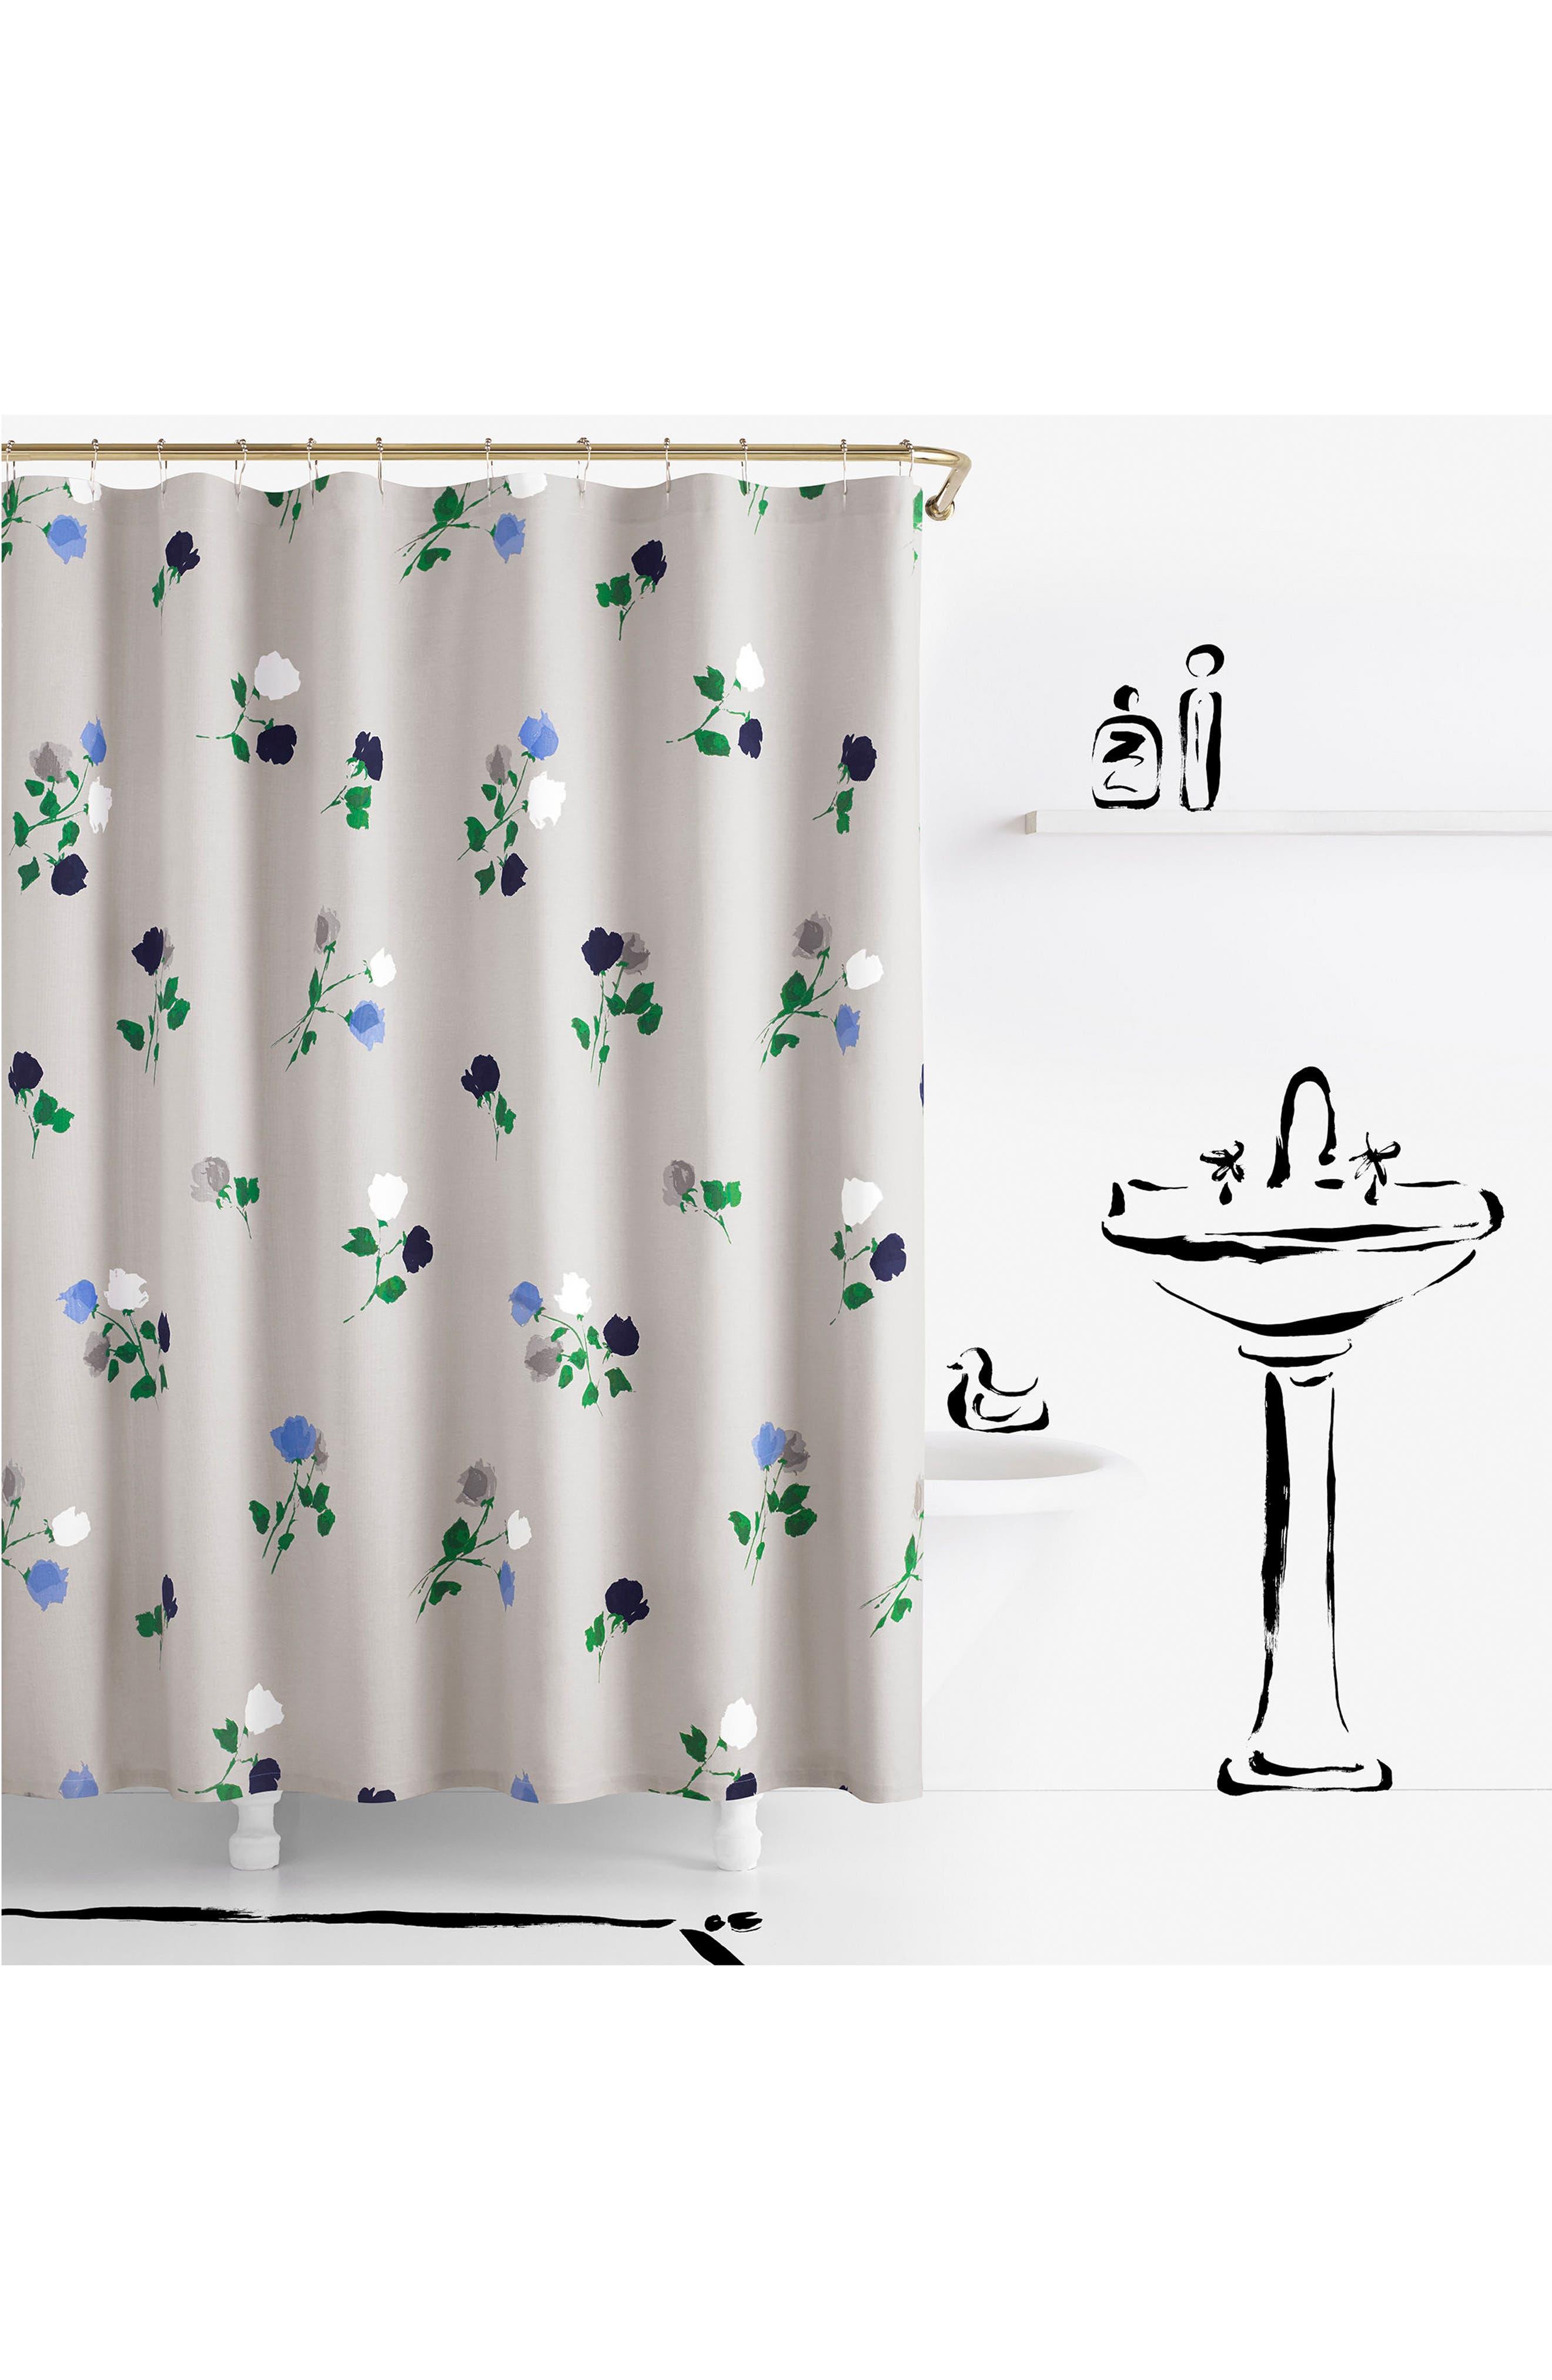 willow court shower curtain,                         Main,                         color, Platinum